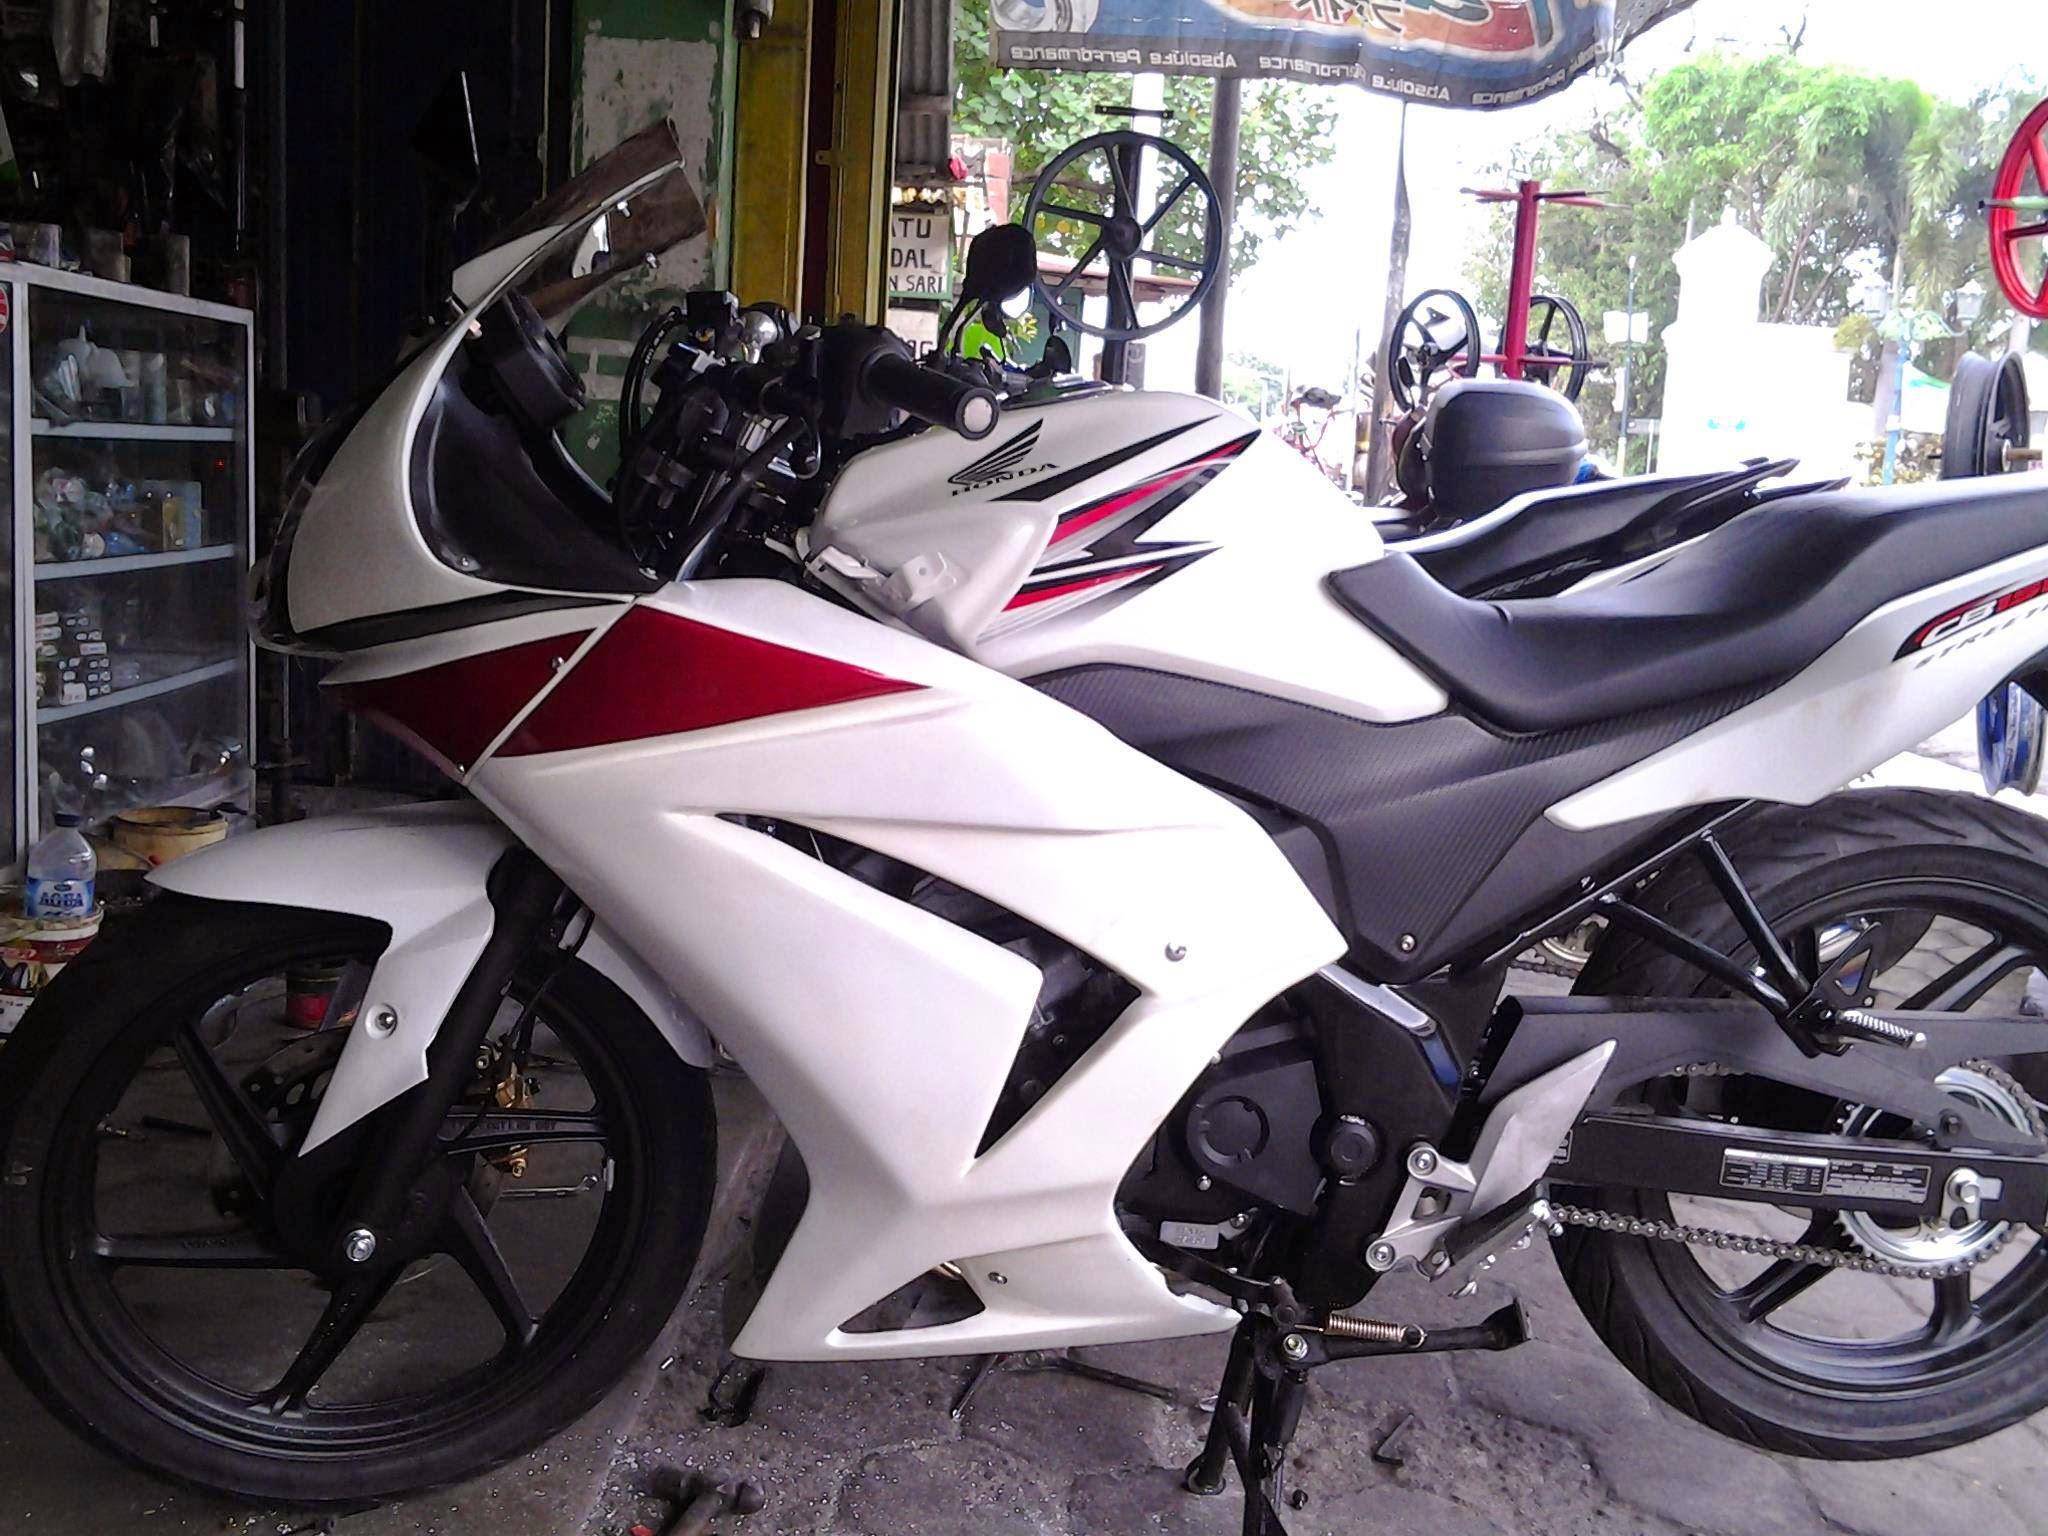 Foto Modifikasi Motor Honda Cb150r Full Fairing Terunik Sodo